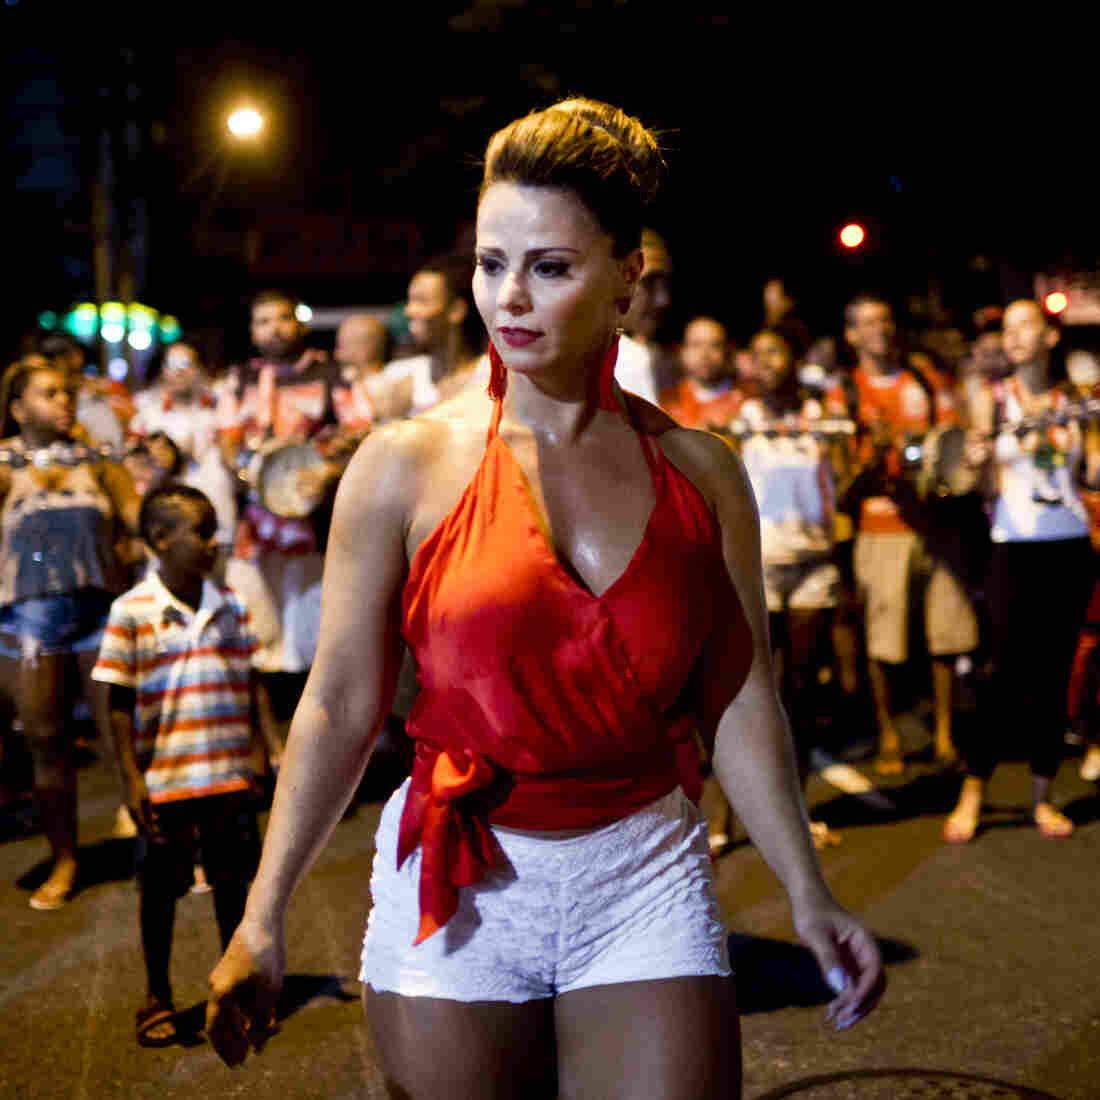 Viviane Araujo, a Salguiero samba school queen, performs at a rehearsal for Carnival in Rio de Janeiro. Marcello da Cunha Freire, vice president of the popular samba school, was murdered last month in a drive-by shooting.